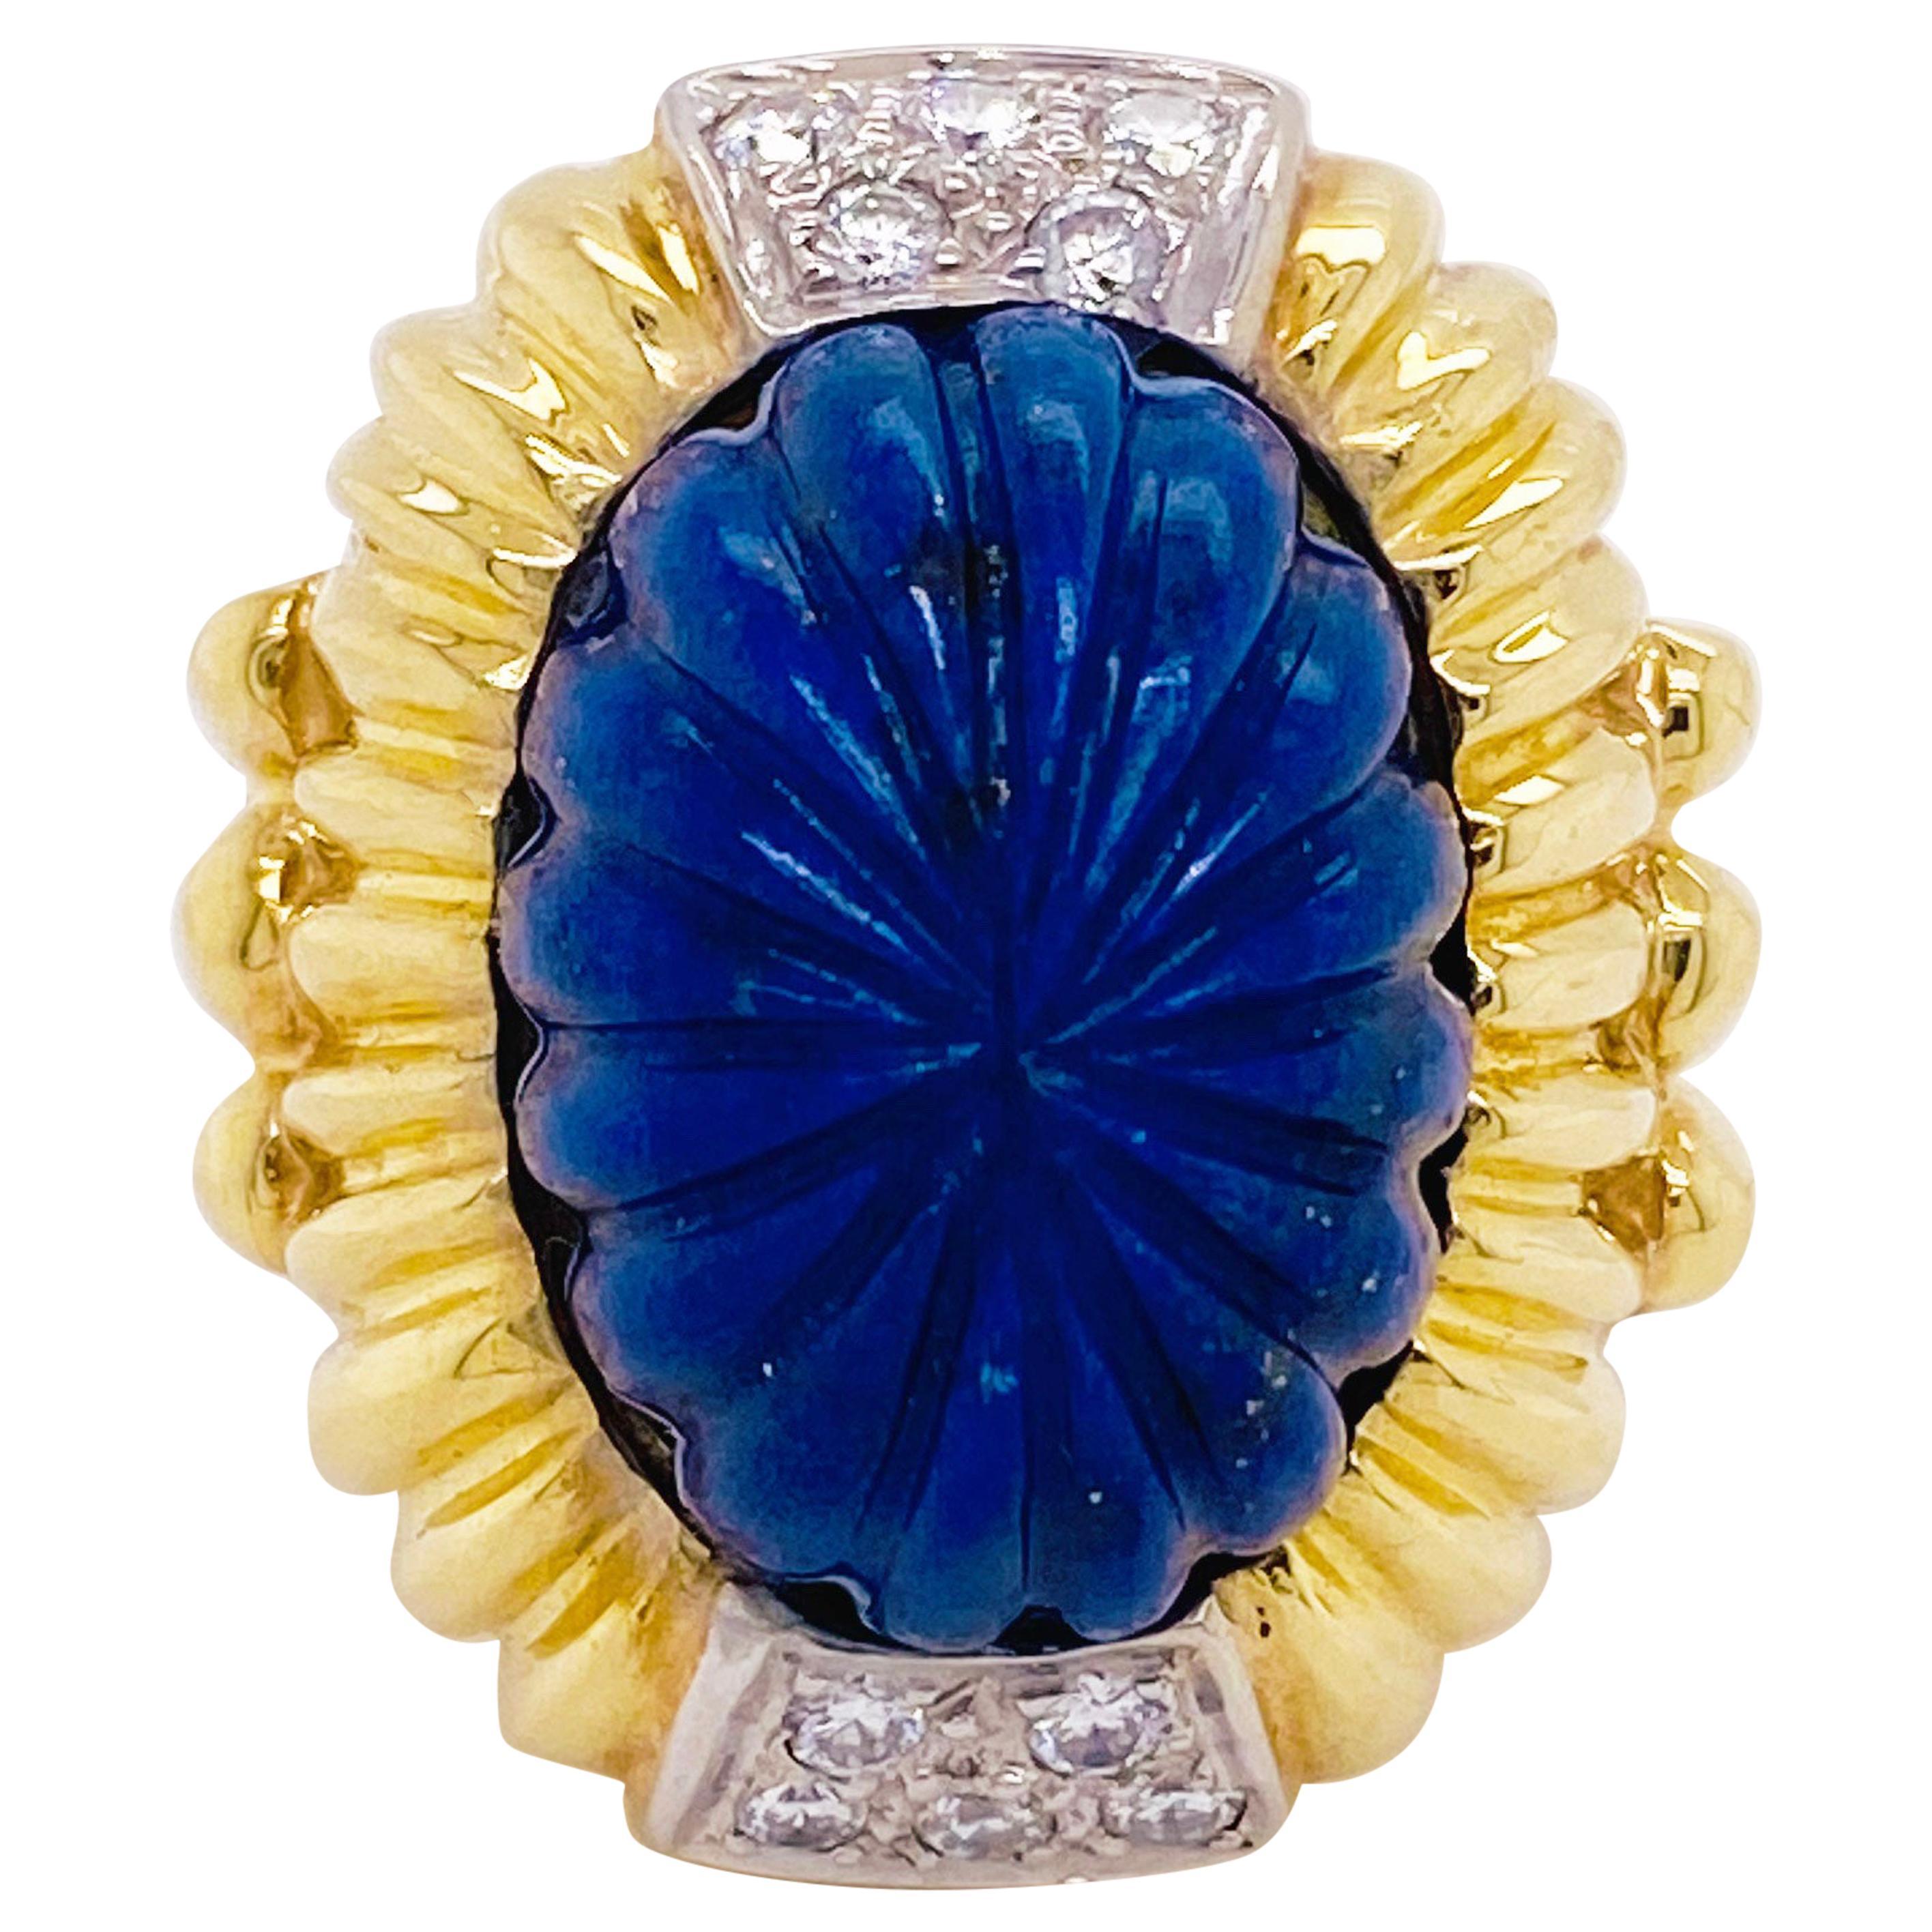 Blue Lapis Bombe Ring circa 1970, Bombe, Vintage R. Stone Designer un 18k yellow